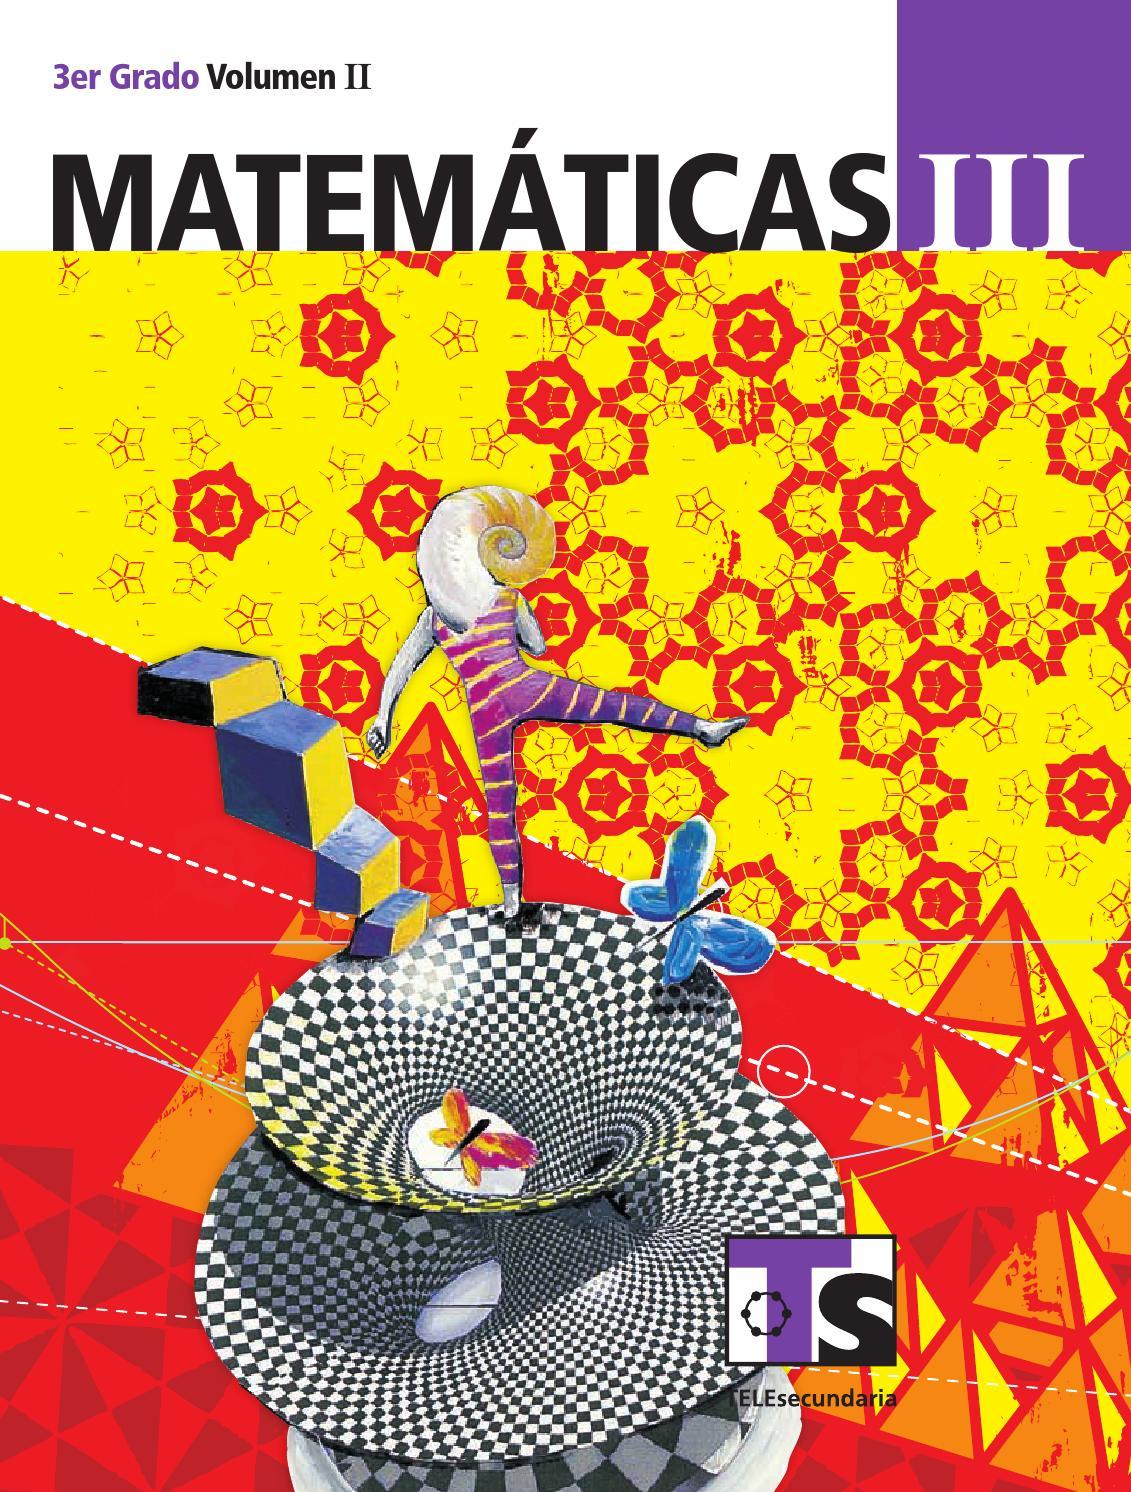 Matemáticas 3er. Grado Volumen II by Rarámuri - issuu